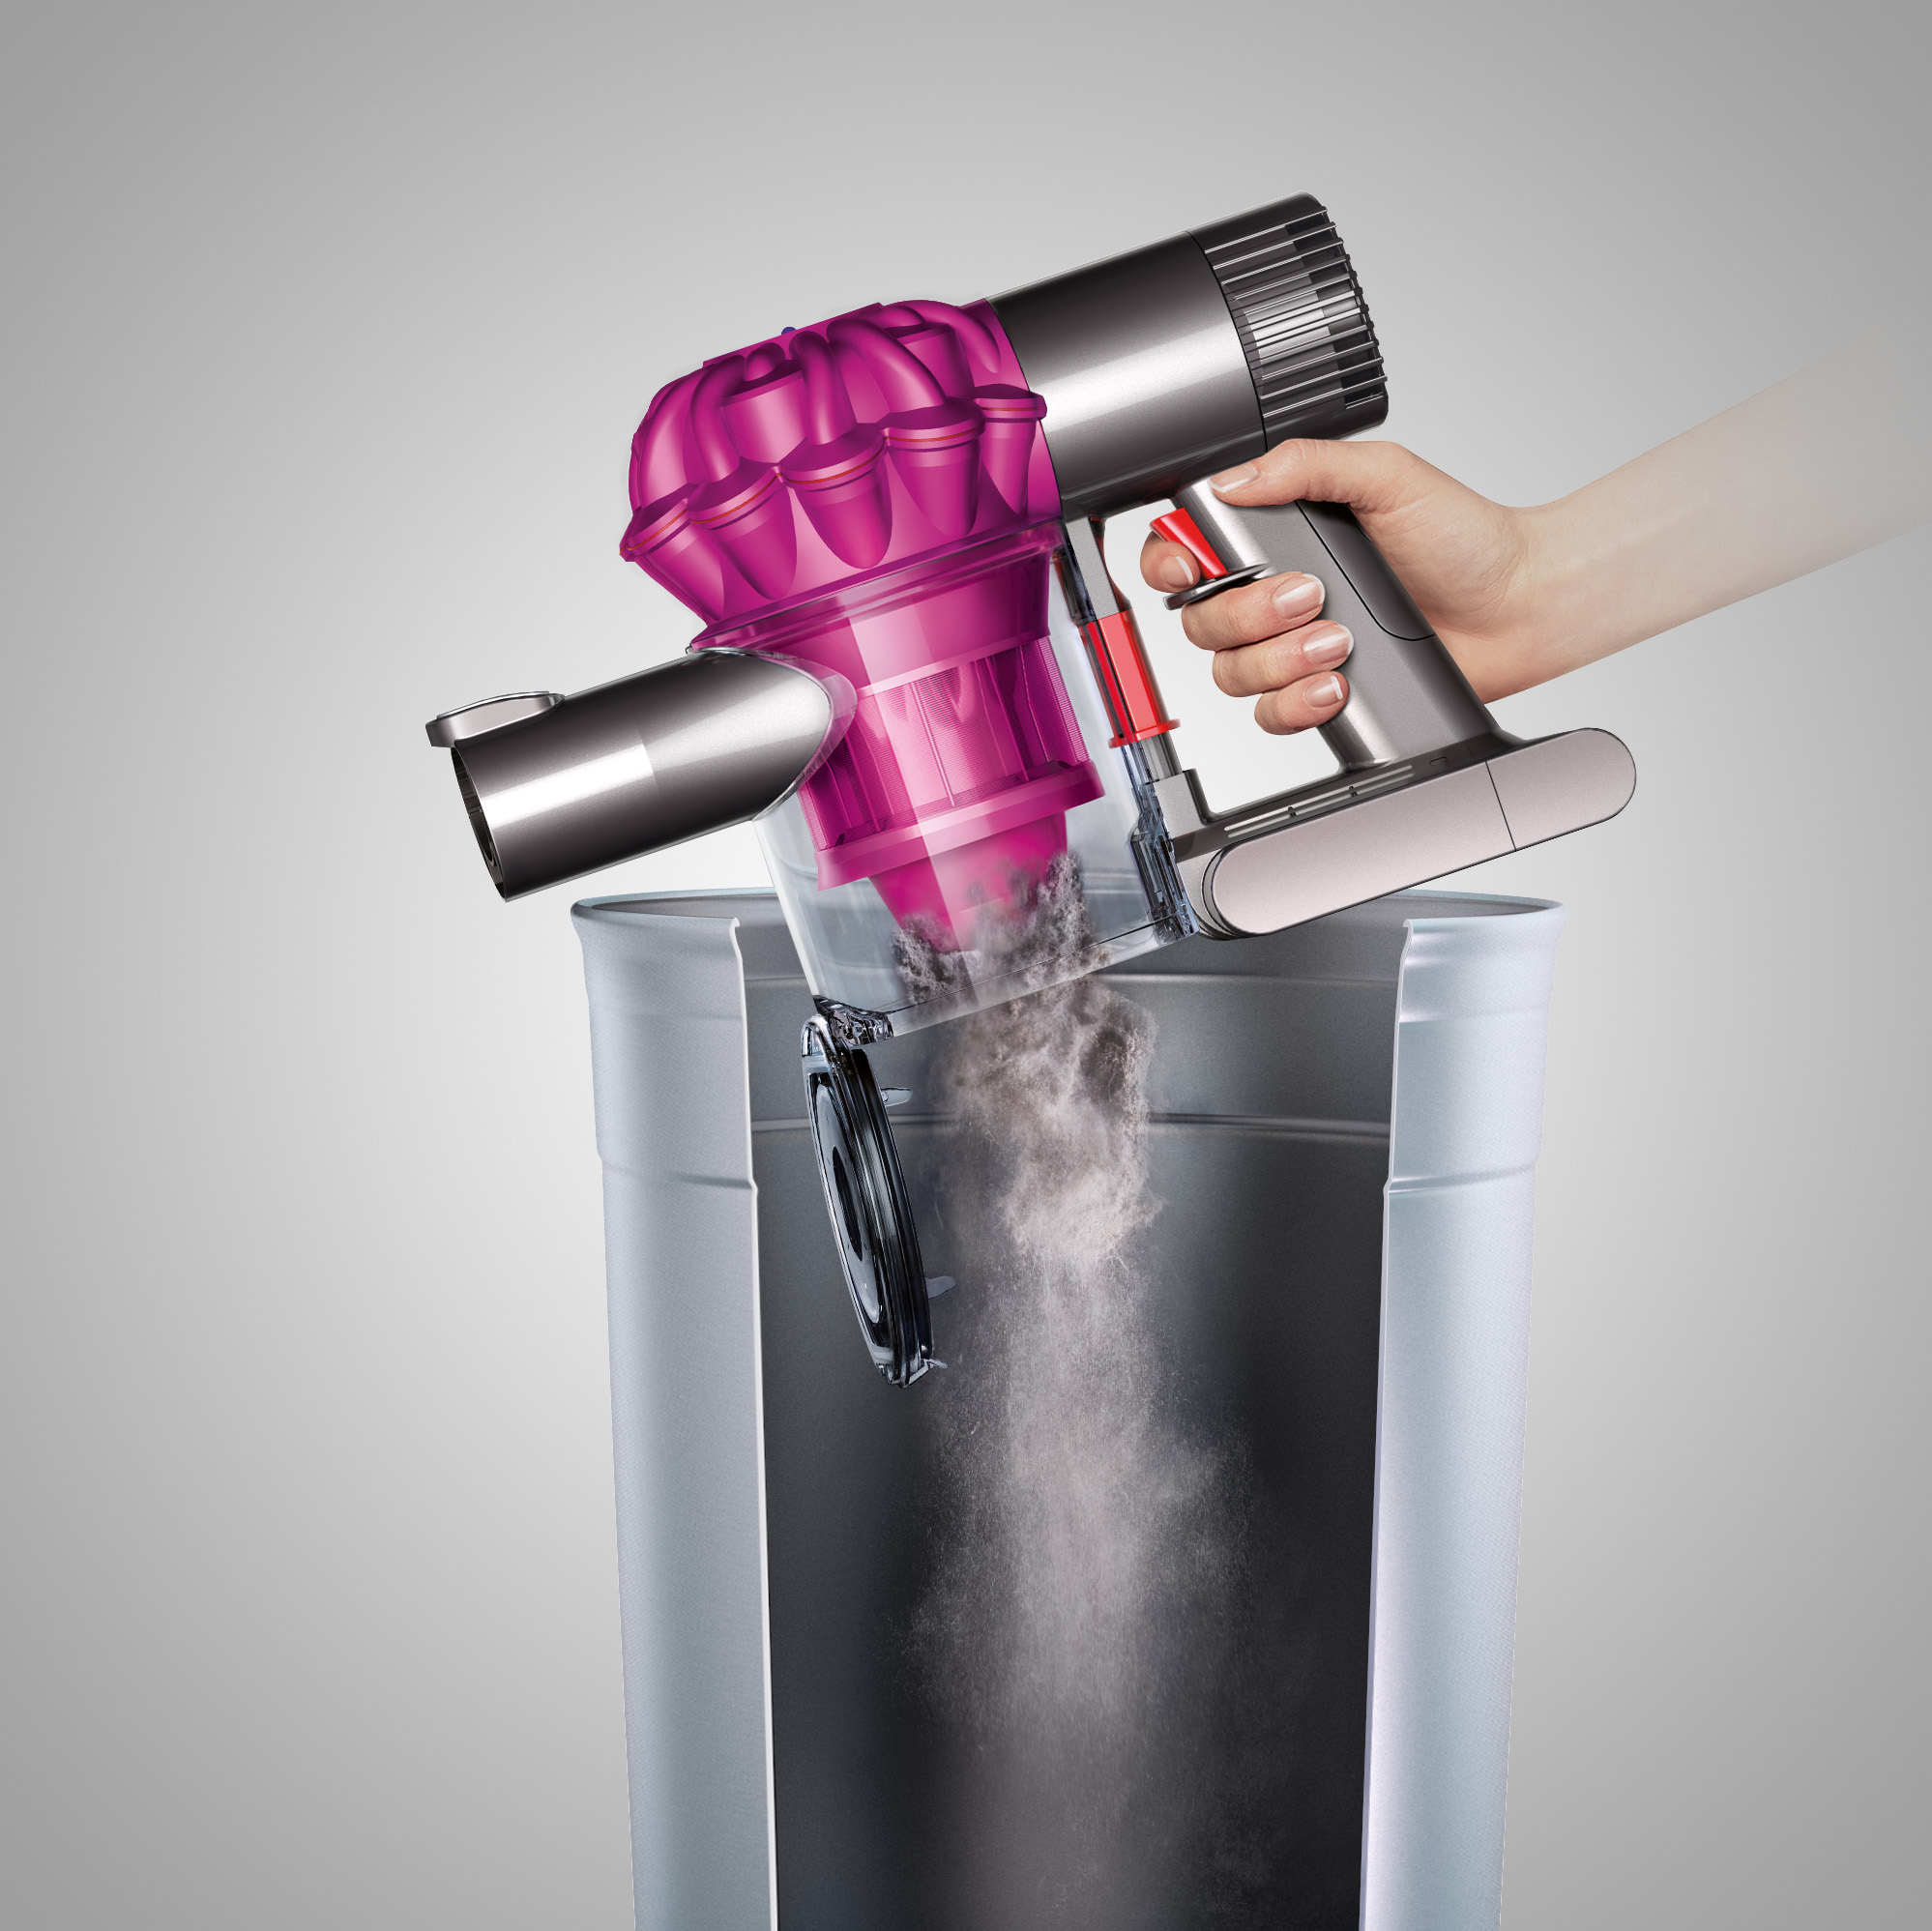 Dyson-V6-Motorhead-Cordless-Vacuum-Fuchsia-Refurbished